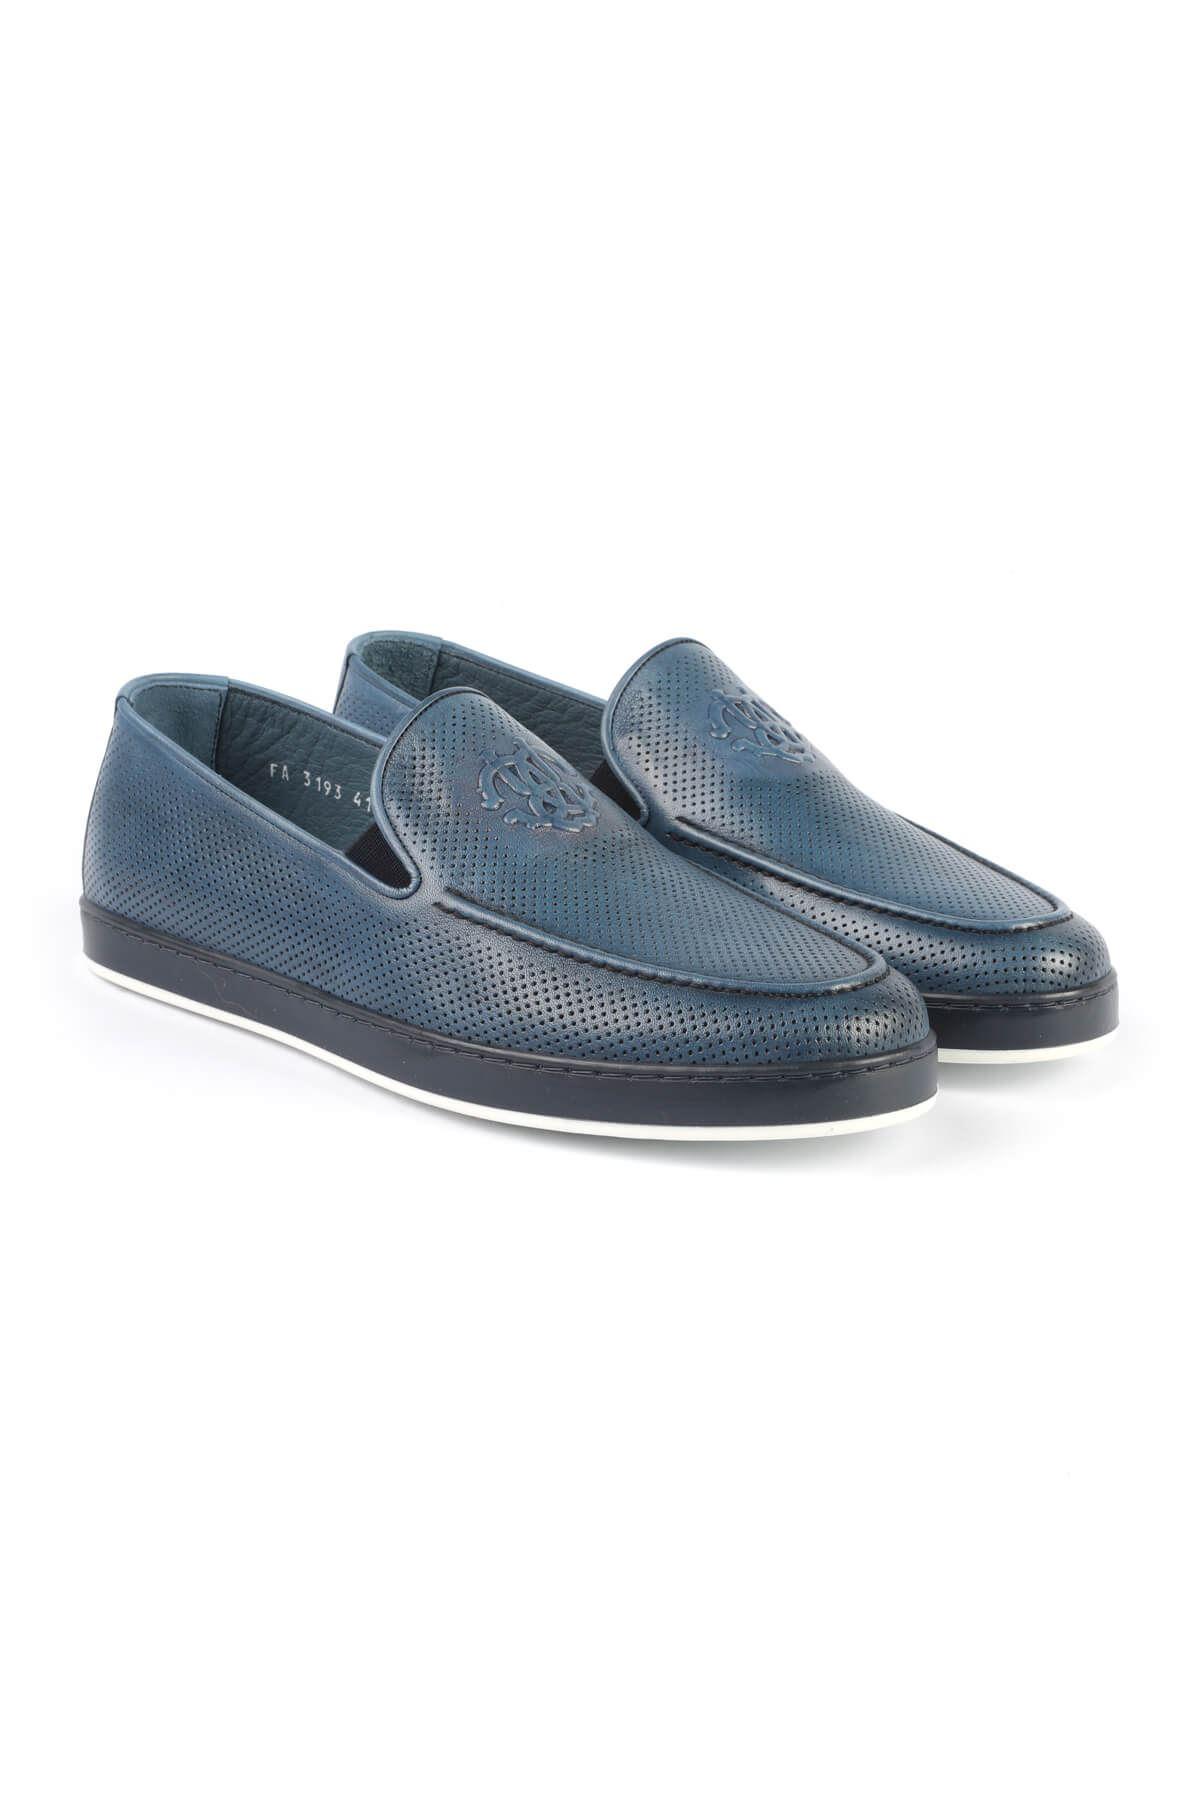 Libero 3193 Mavi Loafer Ayakkabı